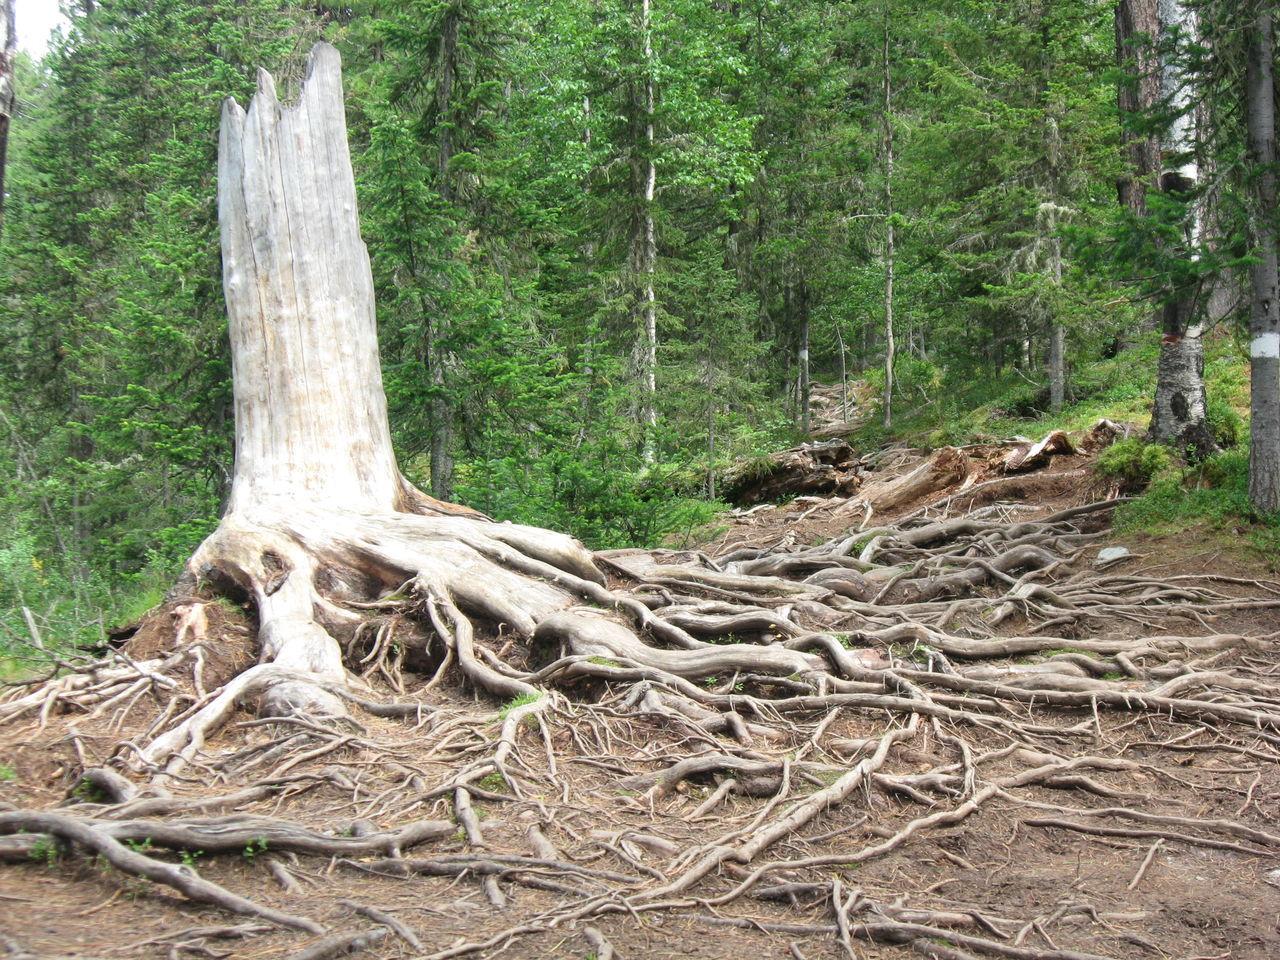 Страж тайги. Nature сибирь No People Природа Green Color взаимнаяподписка Beauty In Nature Россия Forest Tree